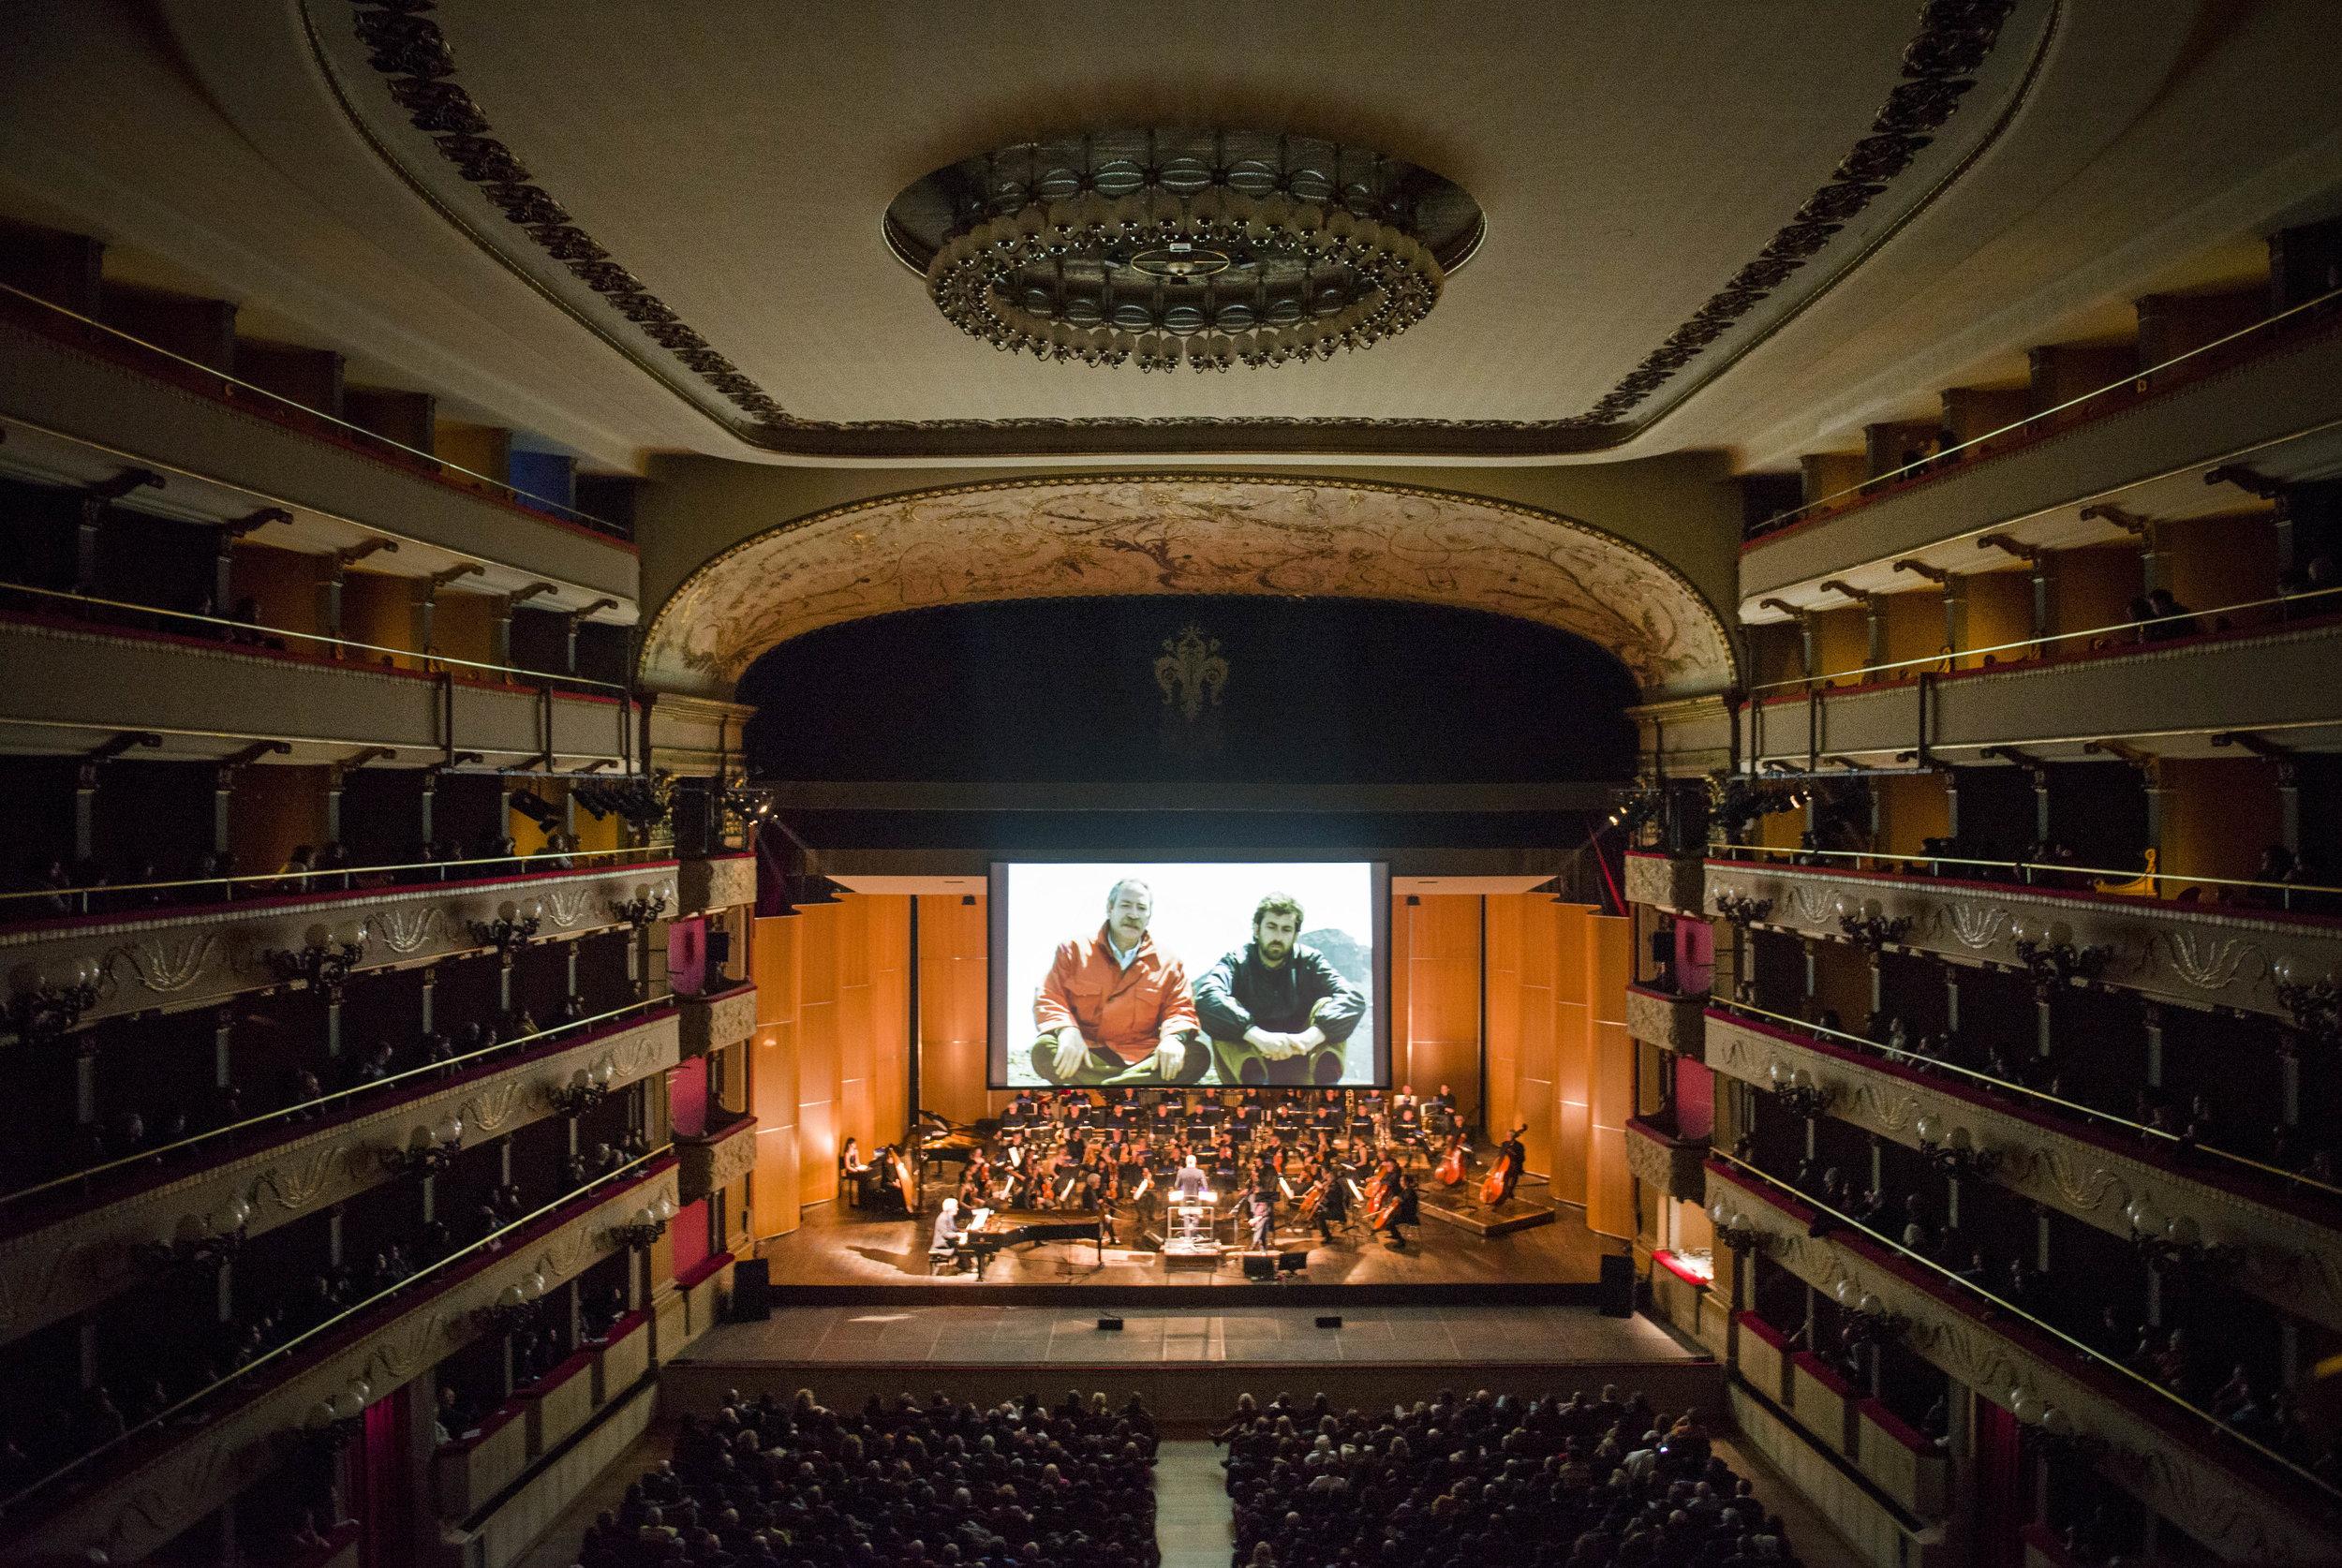 Concerto Moretti - Teatro Verdi in Florence